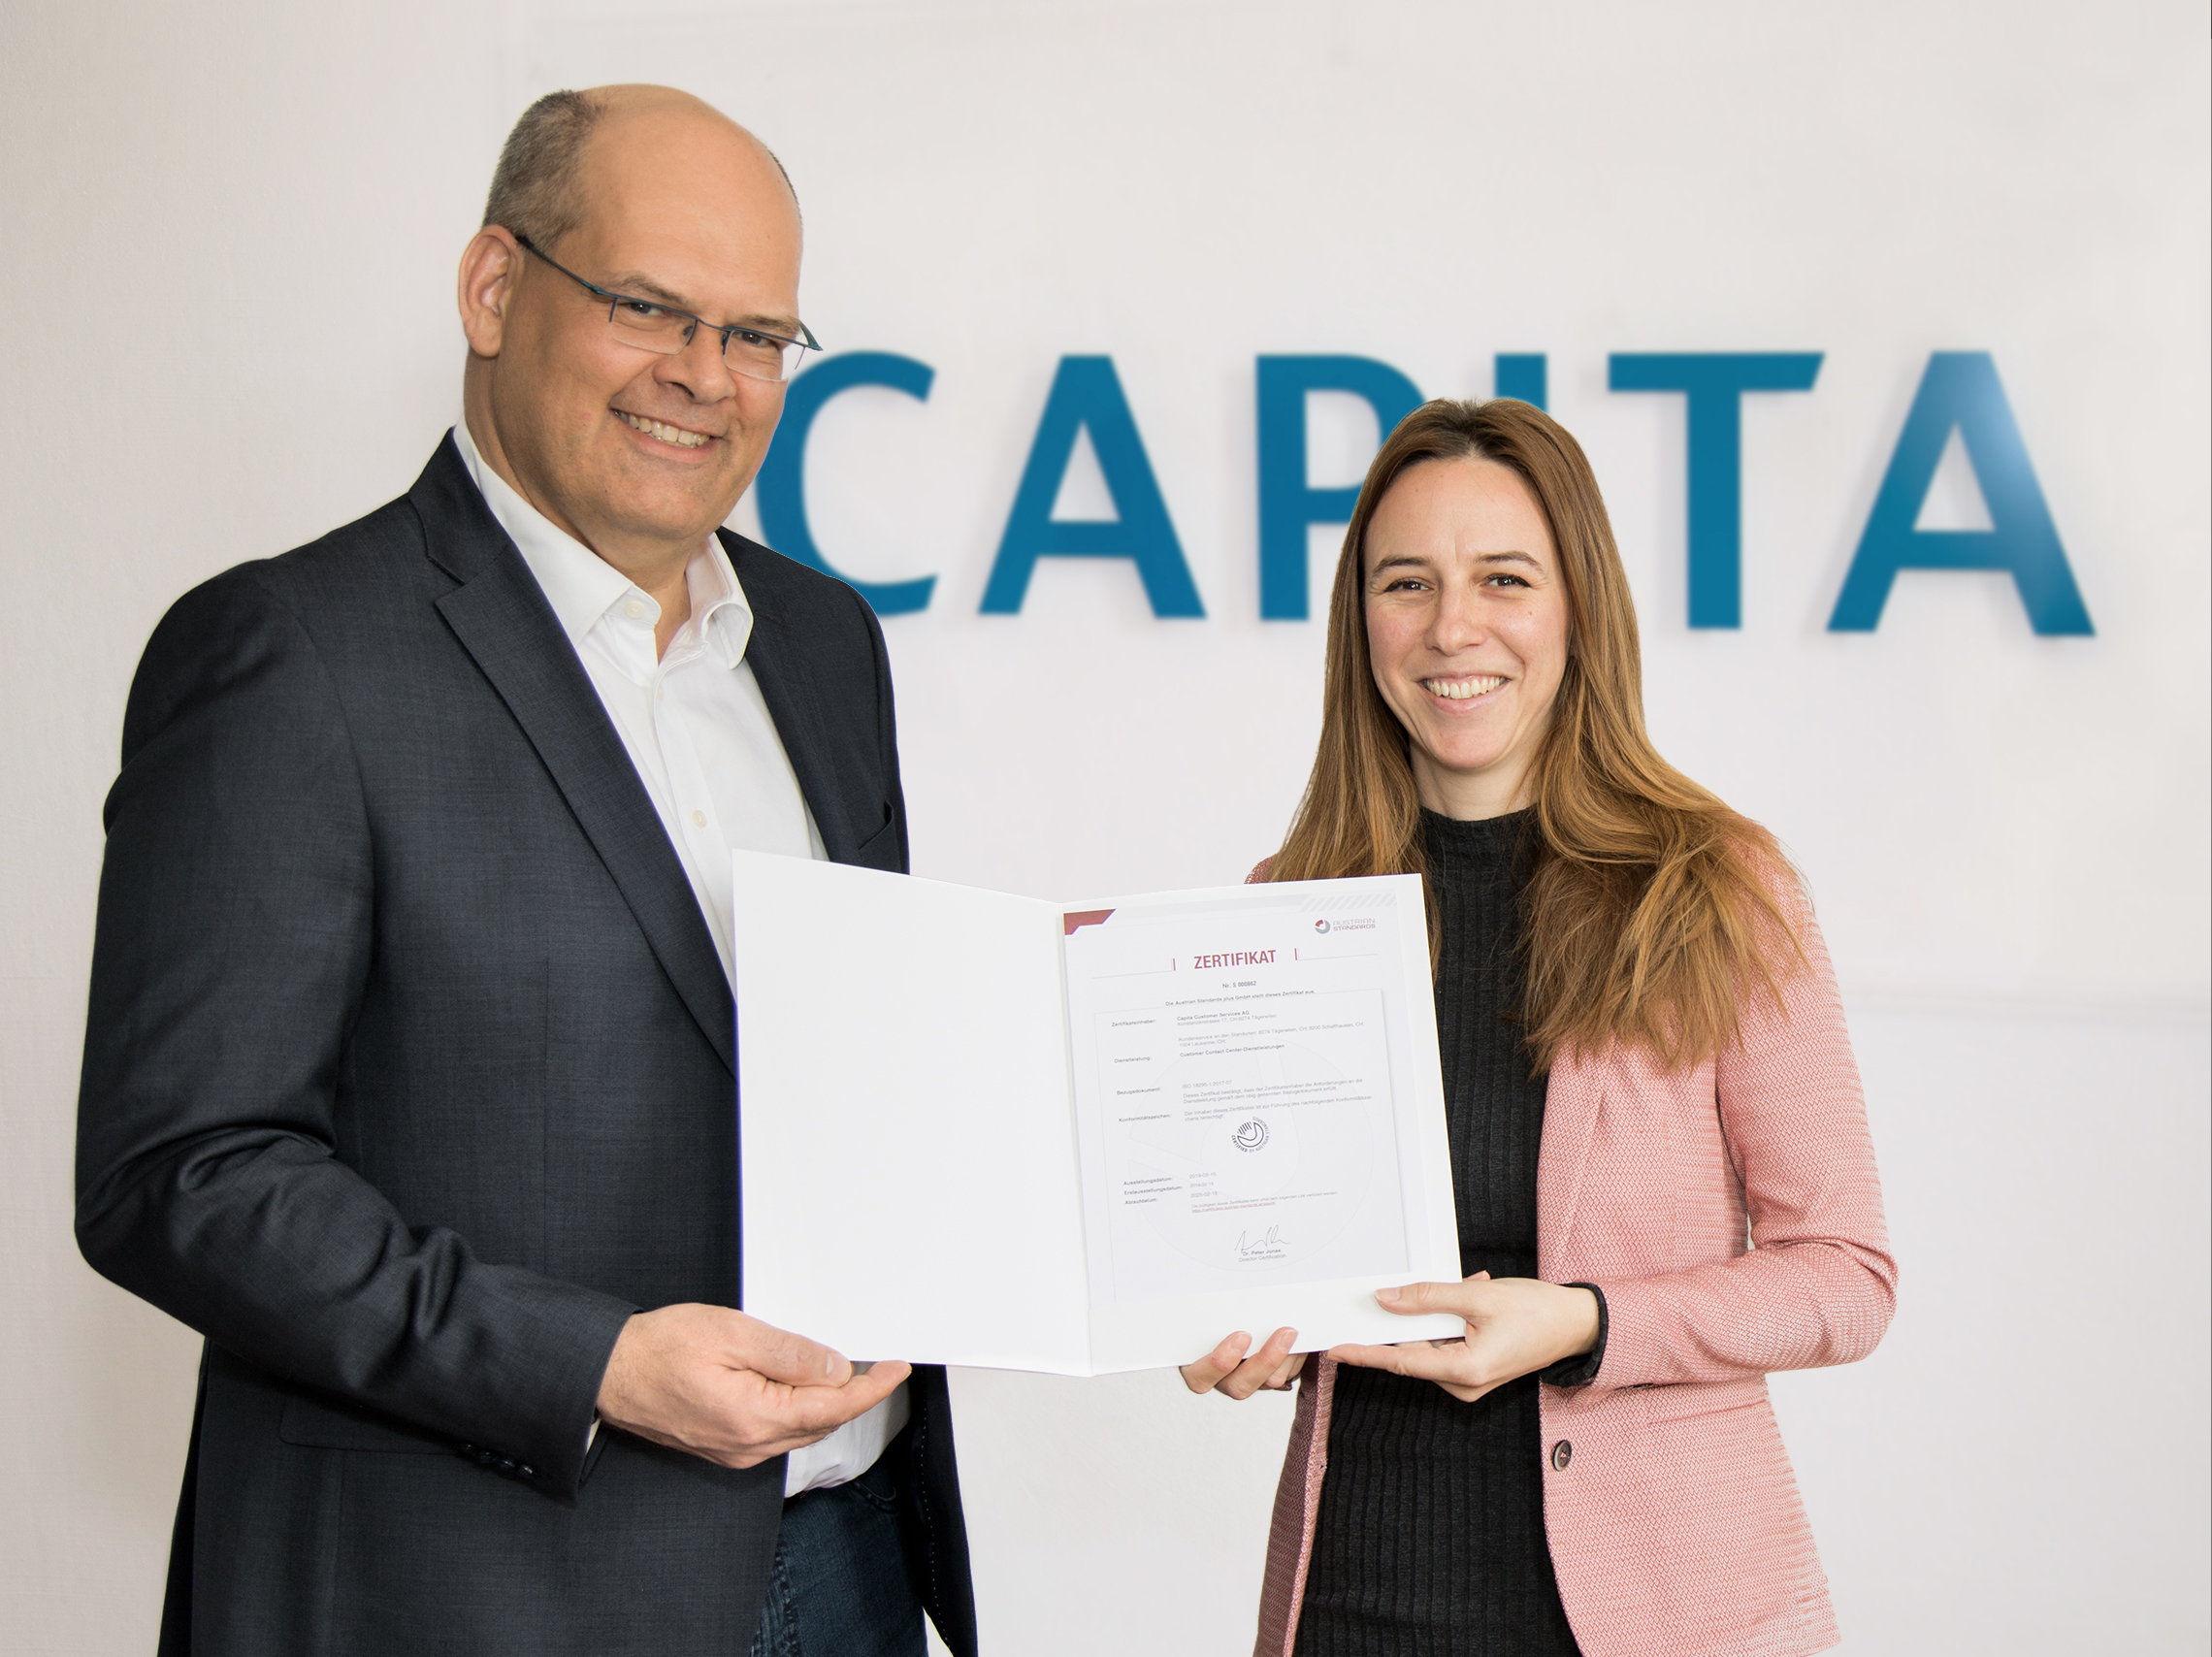 capita_zertifikatsuebergabe_iso18295_20190220